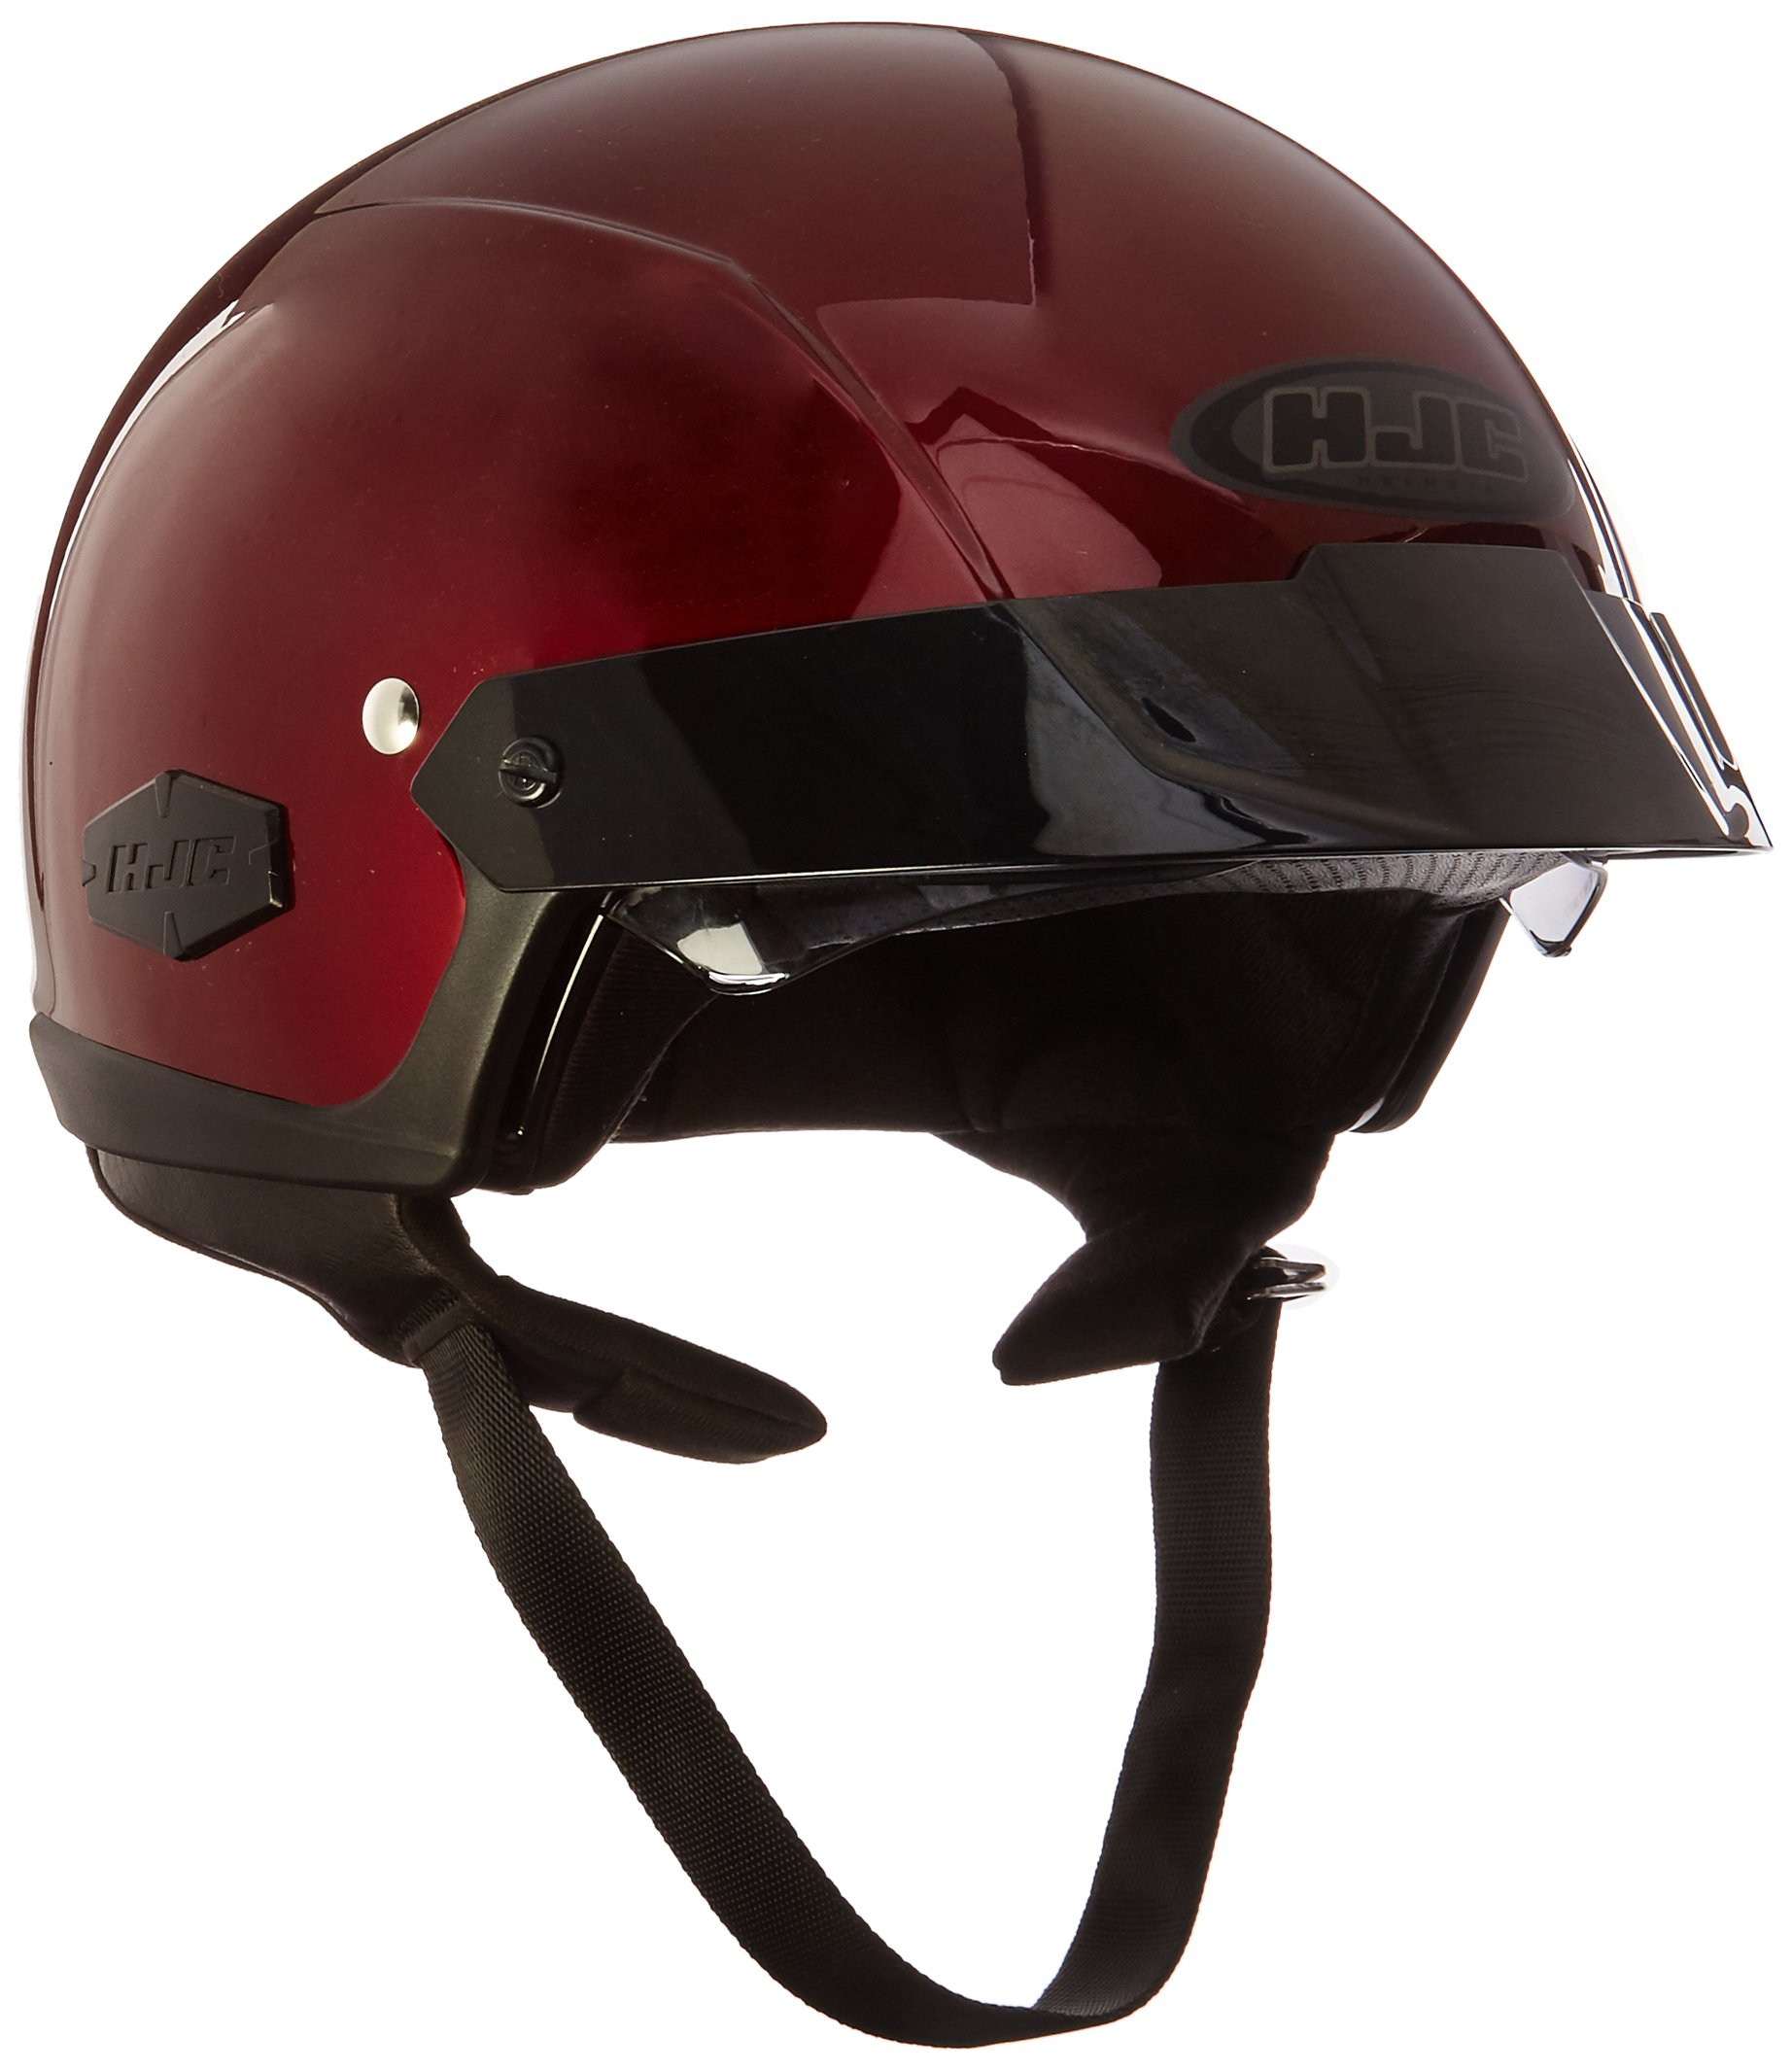 HJC IS-Cruiser Half-Shell Motorcycle Riding Helmet (Wine, X-Small)